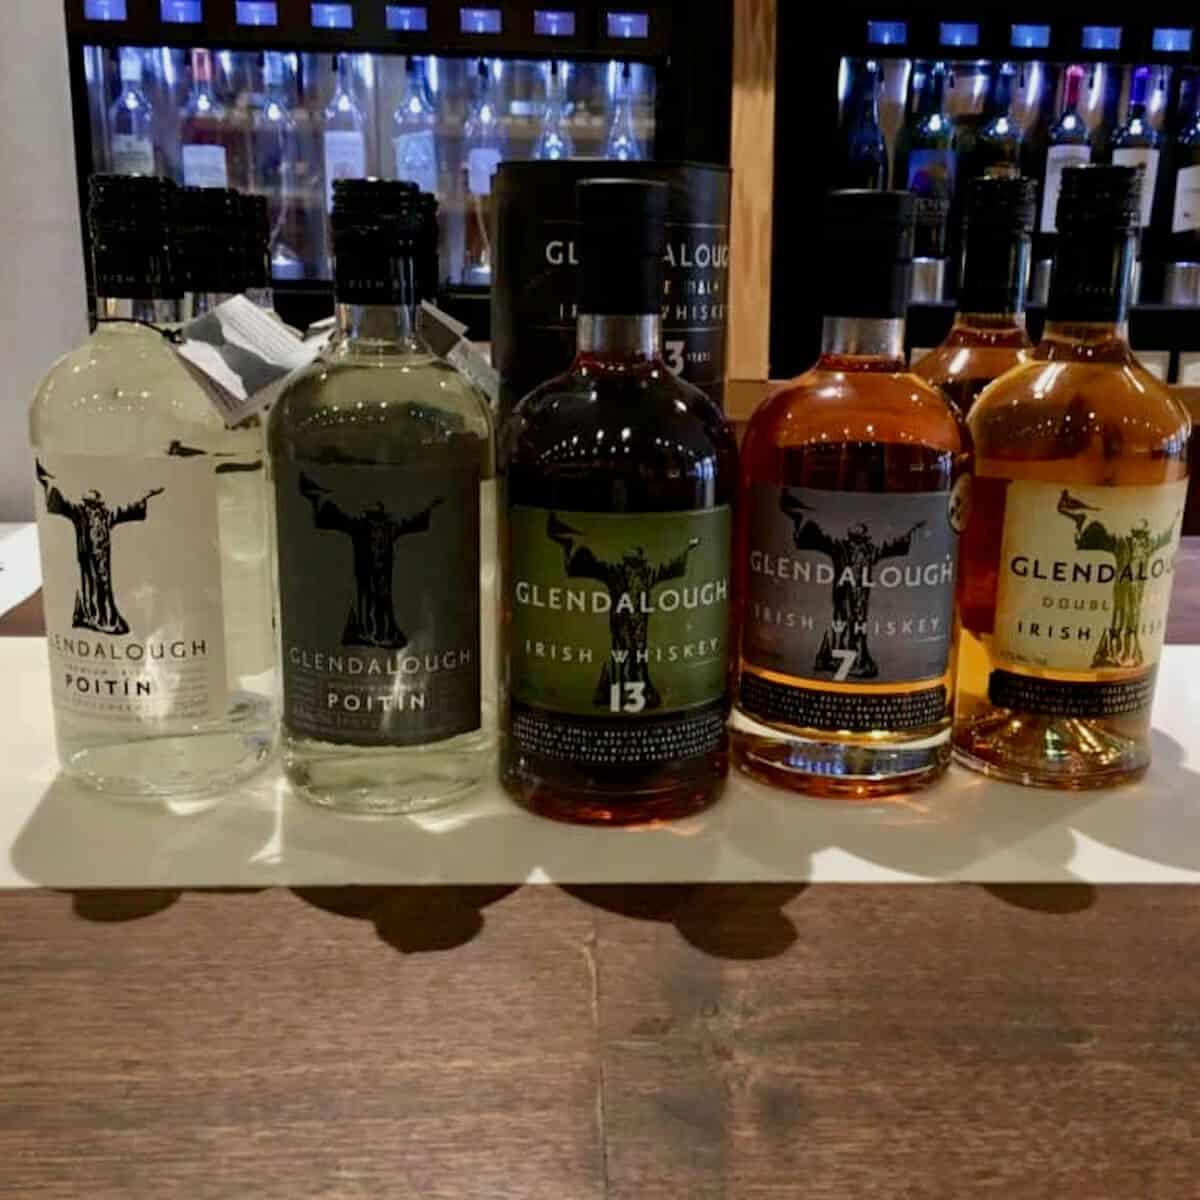 Glendalough Irish whiskey lineup in bottles on a counter.